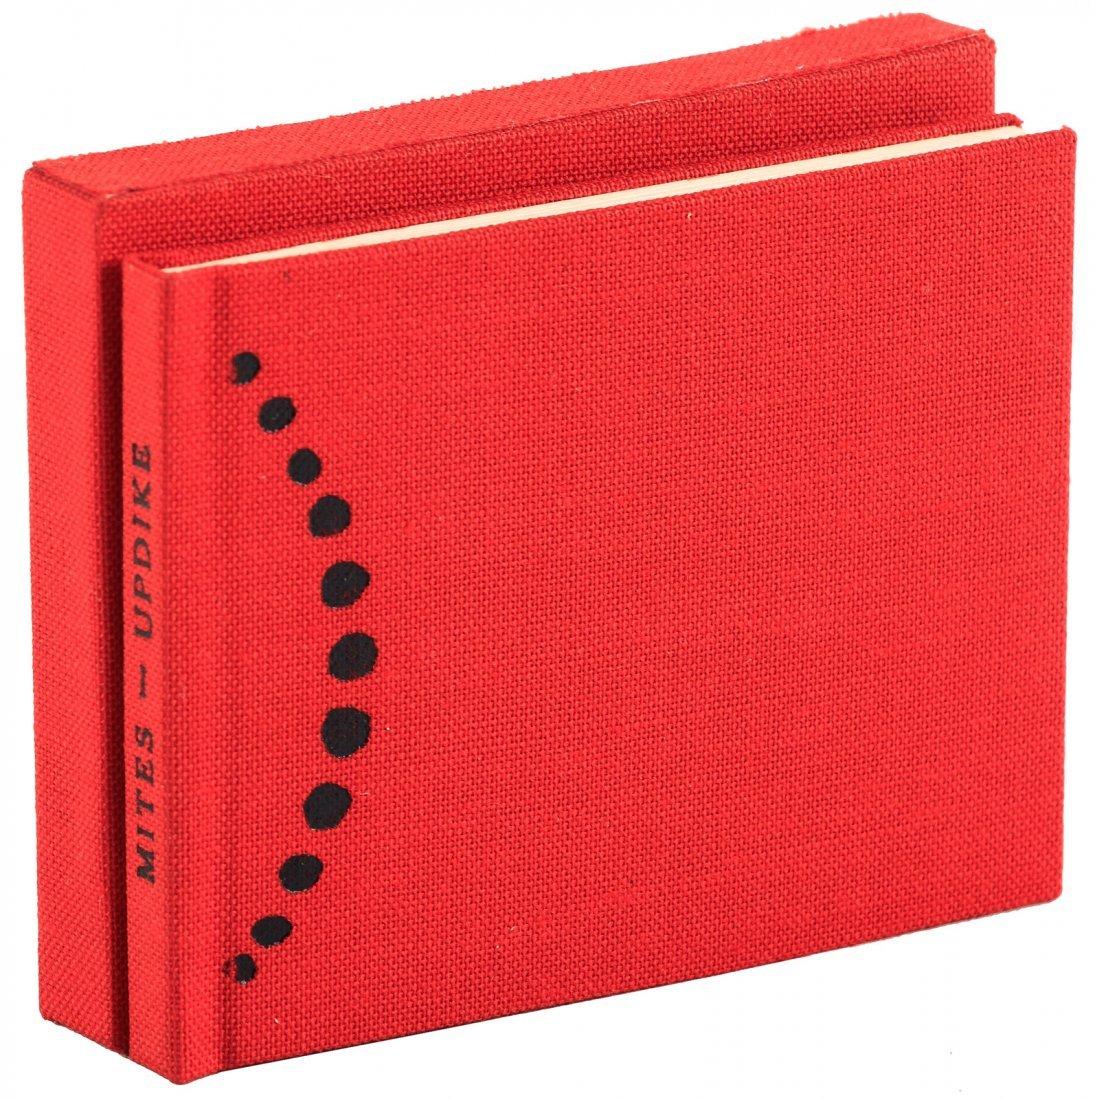 John Updike miniature book Mites One of 26